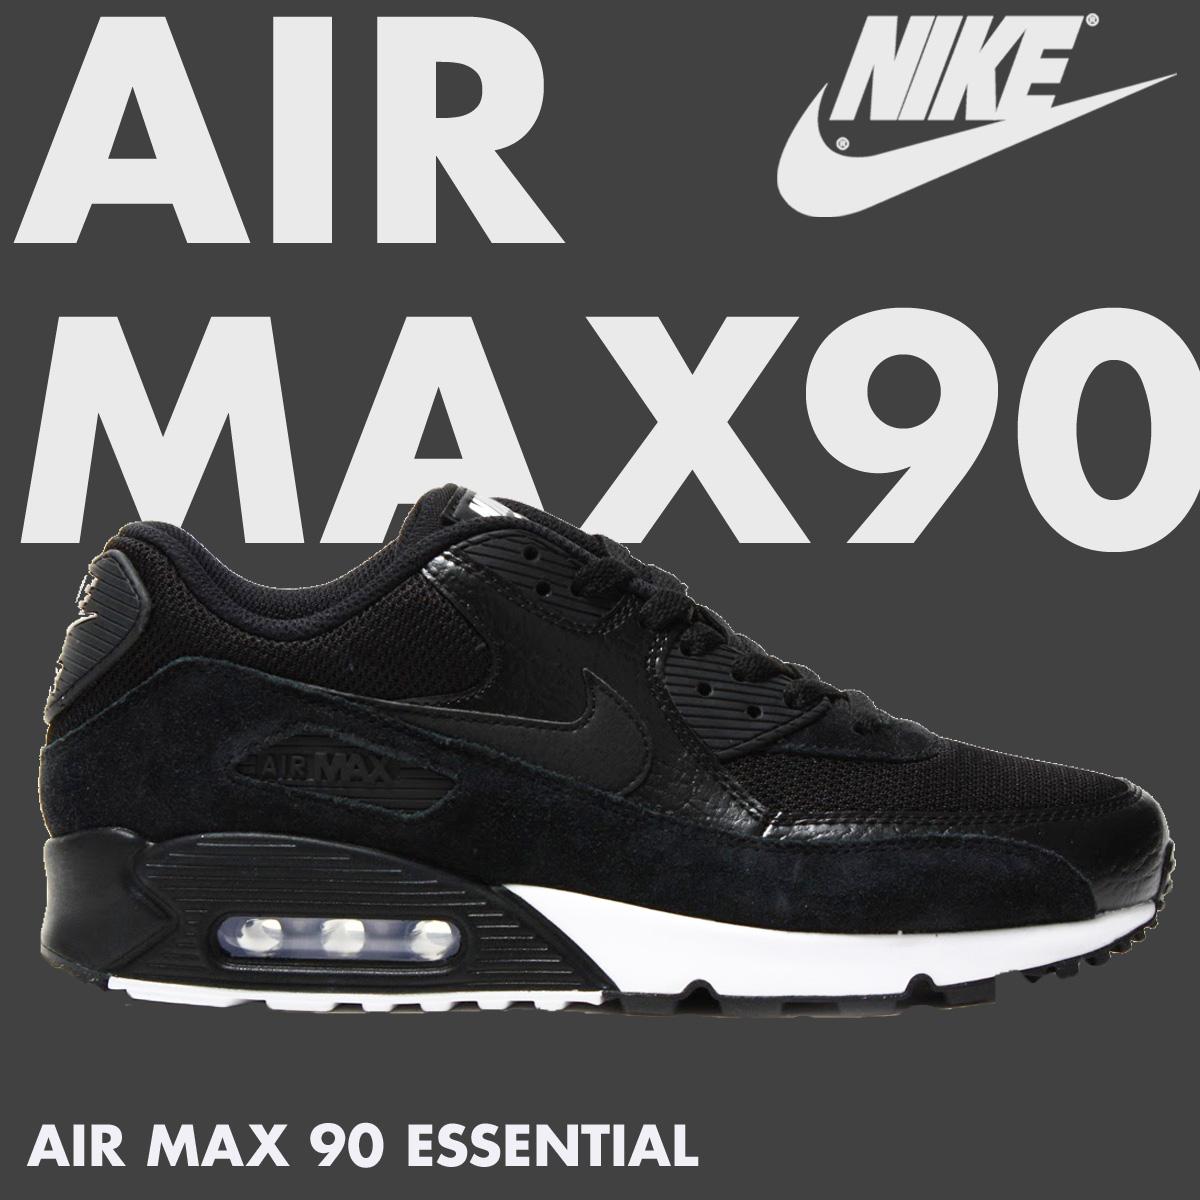 quality design b9556 219fd Nike NIKE Air Max 90 men's sneakers AIR MAX 90 ESSENTIAL 537,384-077 shoes  black [6/28 Shinnyu load]